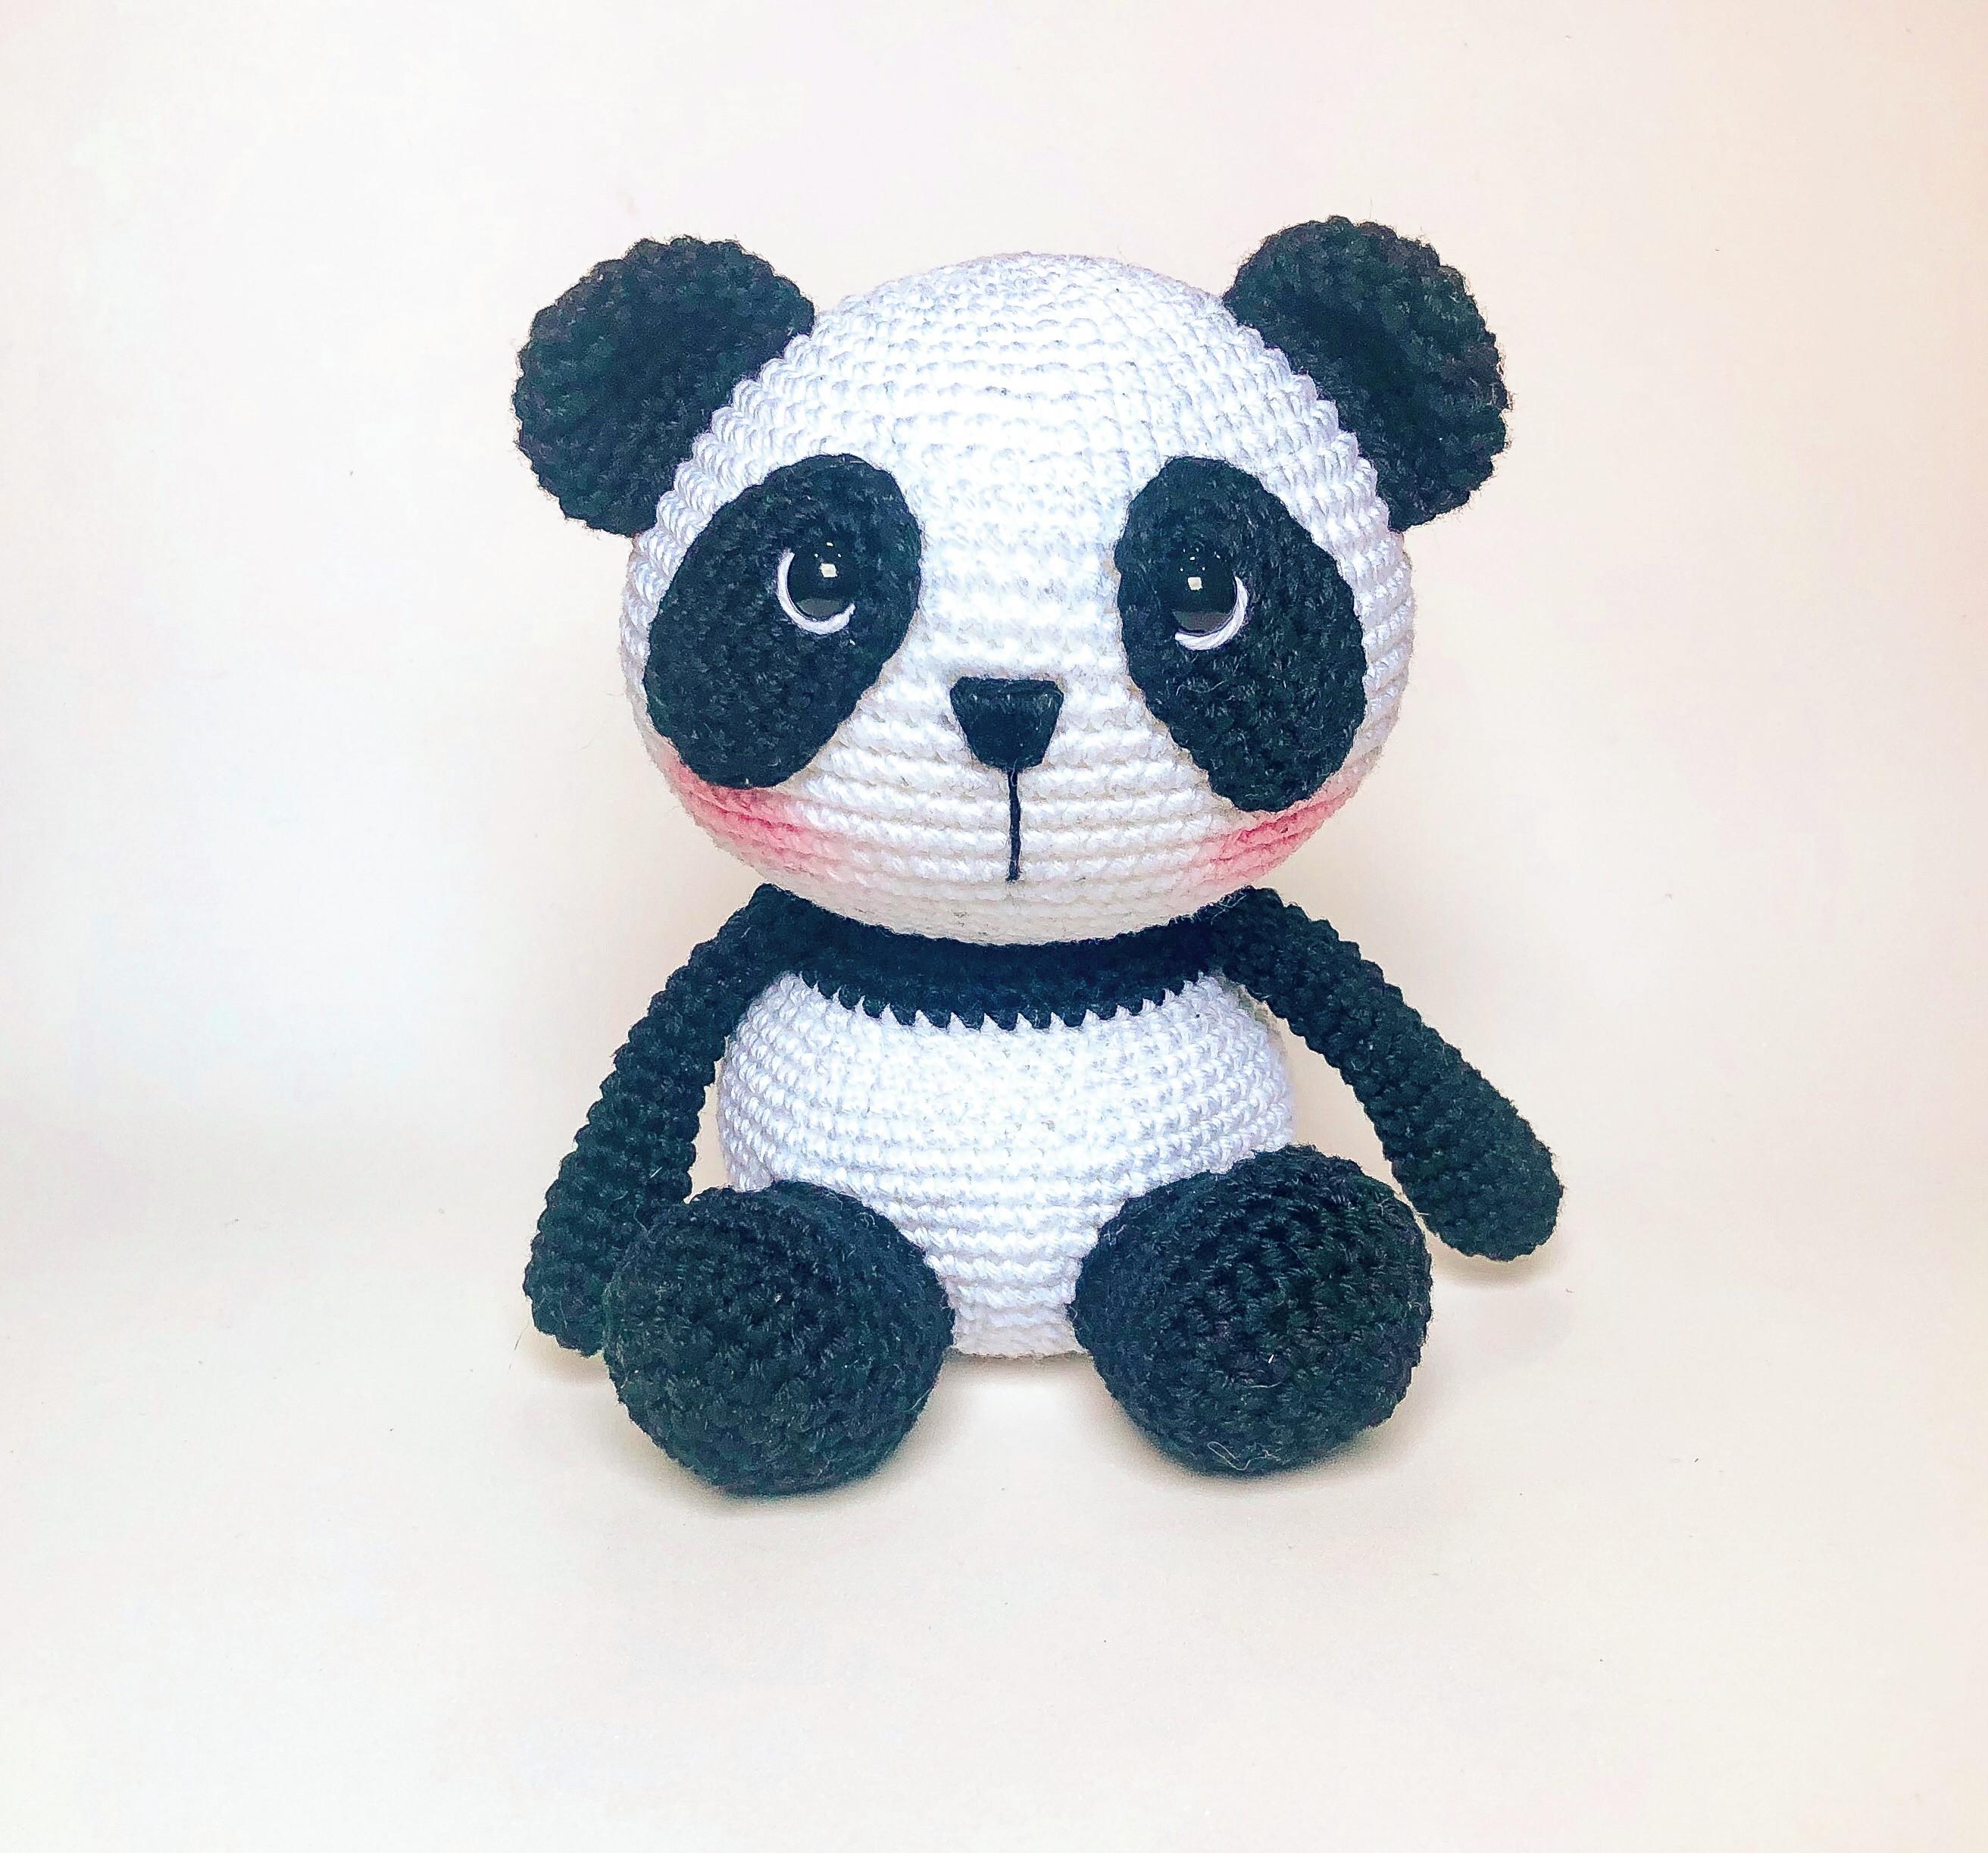 Cuddle Me Bear amigurumi pattern | Estampas de ursinho, Ursos de ... | 2446x2624